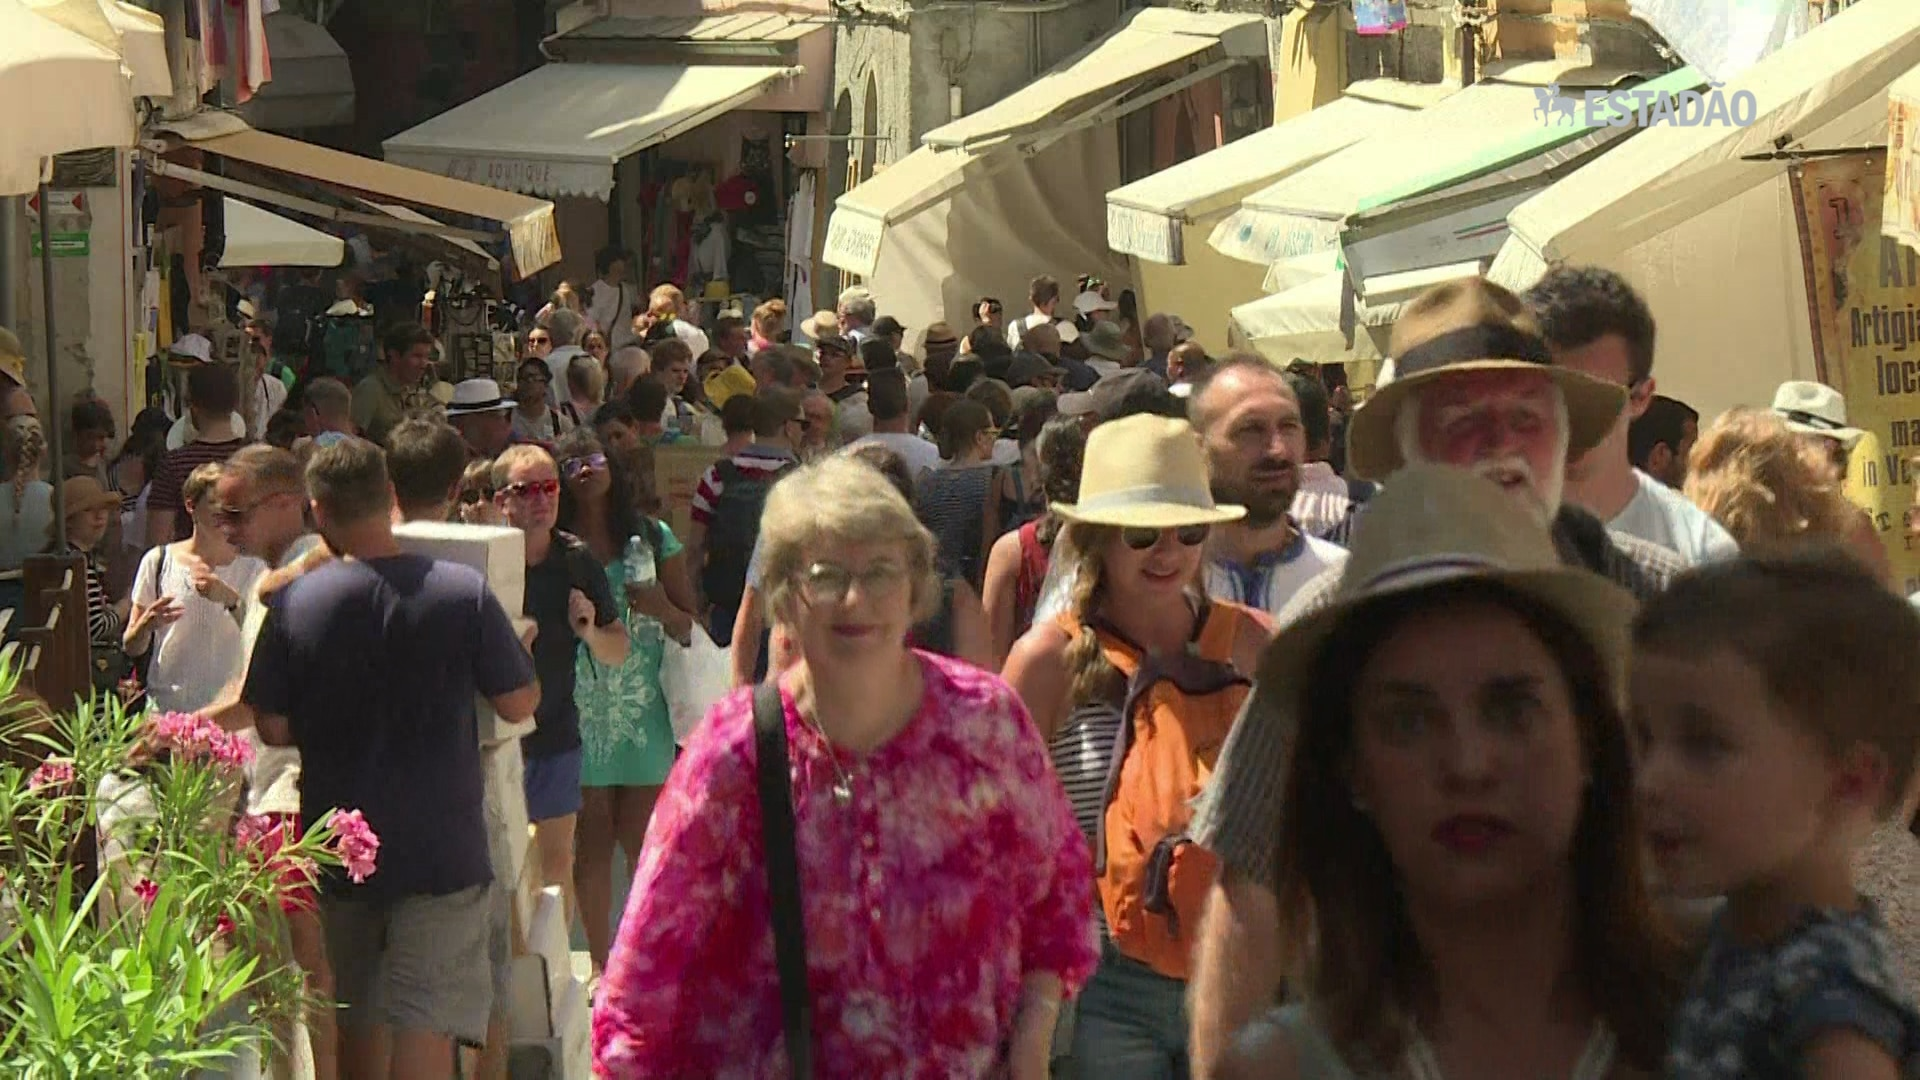 Itália pretende limitar turismo na Cinque Terre